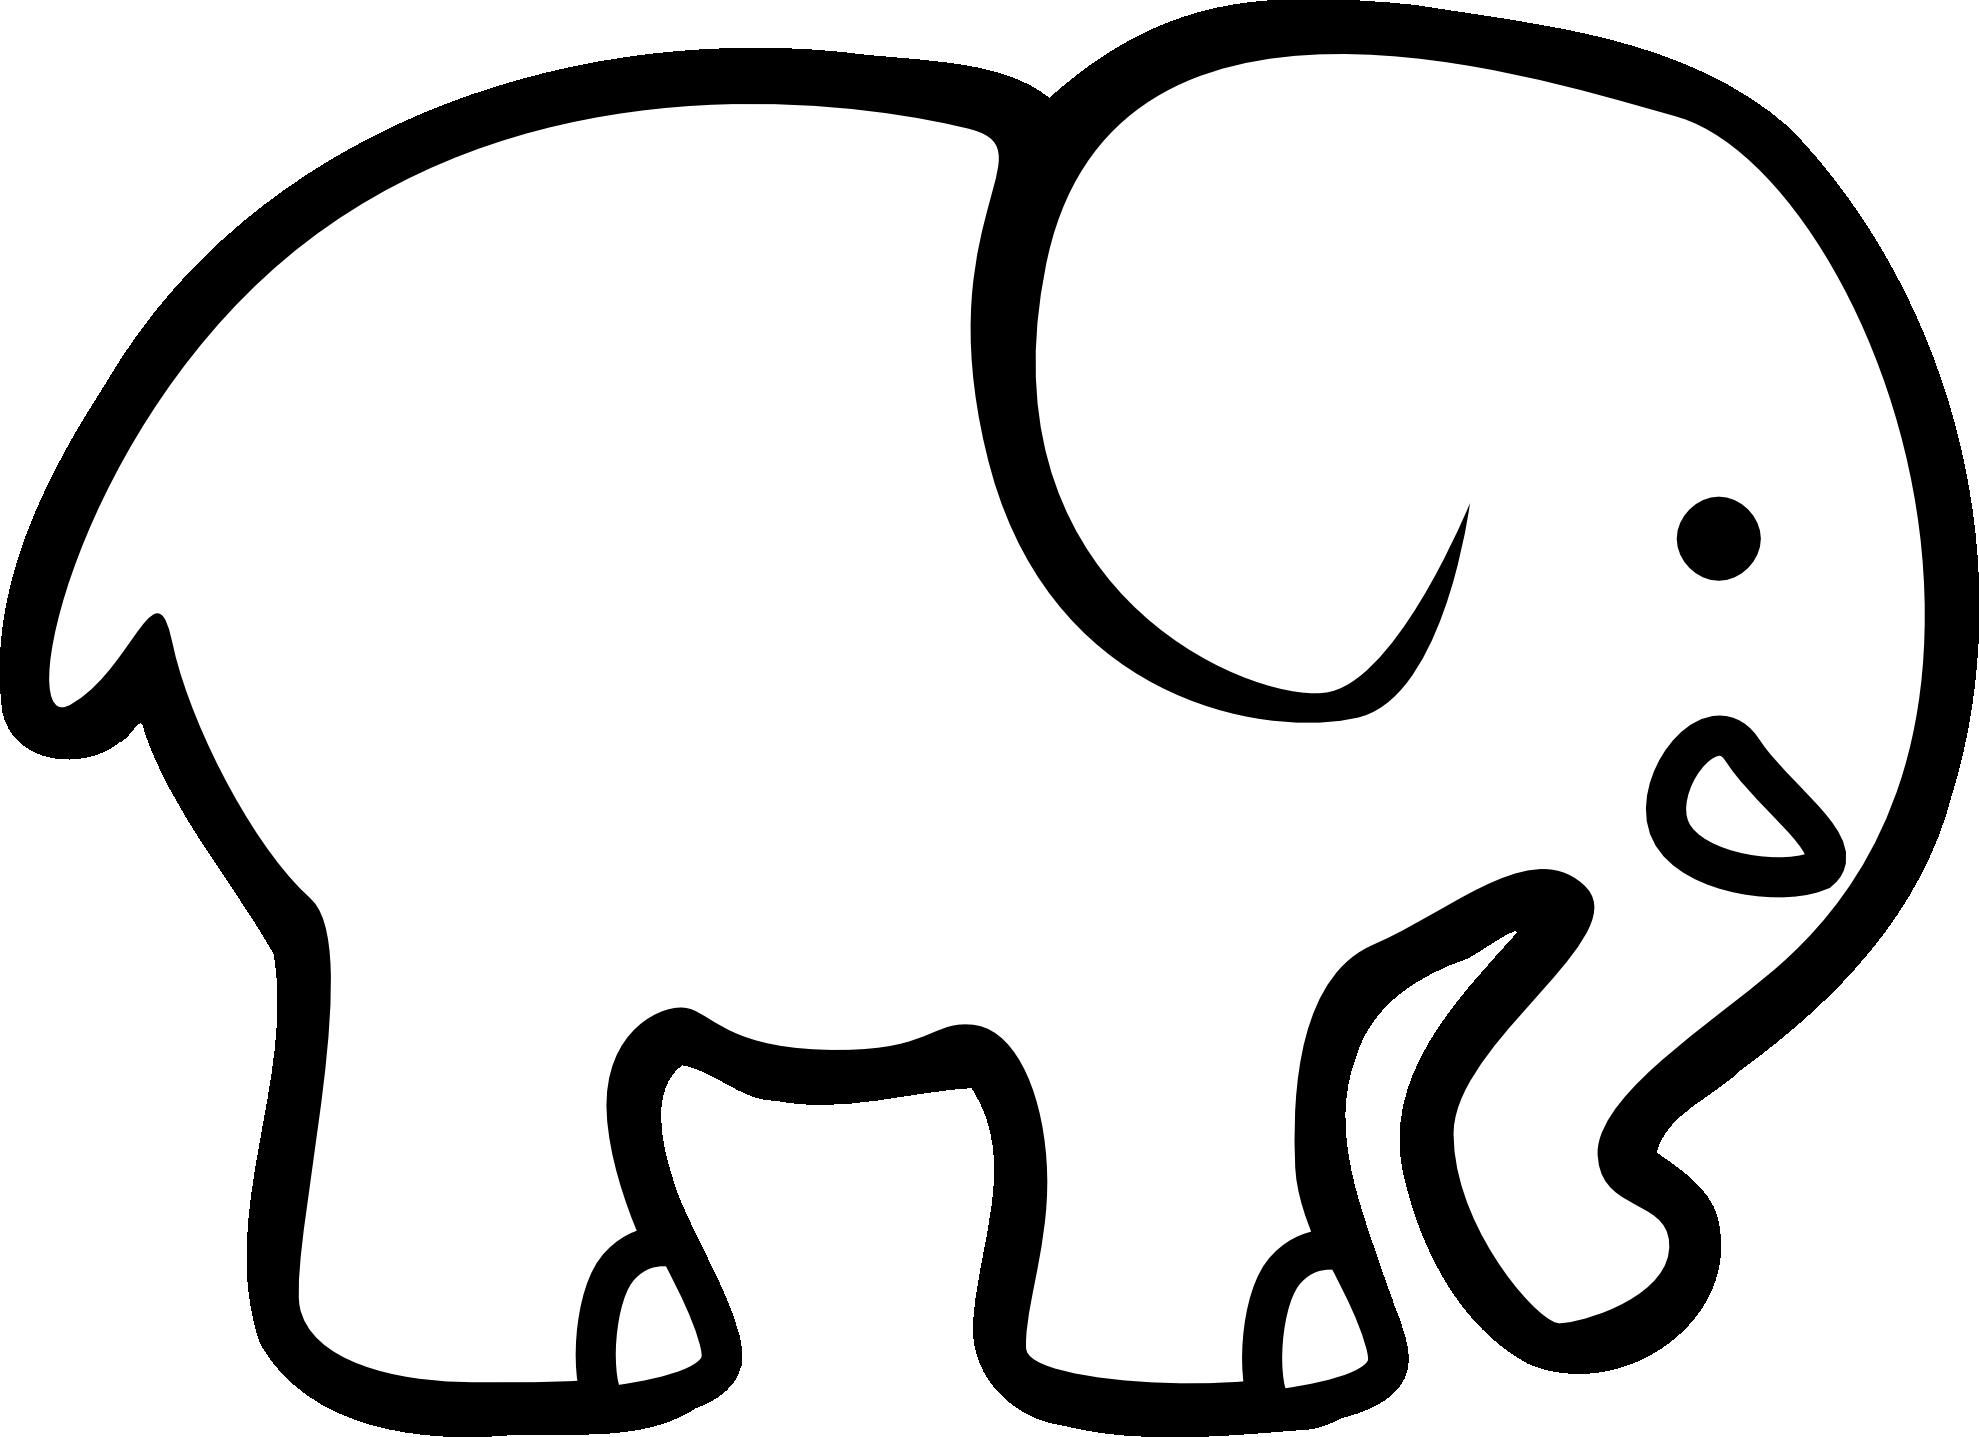 Elephant reading a book clipart svg royalty free cartoon elephant - Google Search | stencils, cut files, svg ... svg royalty free